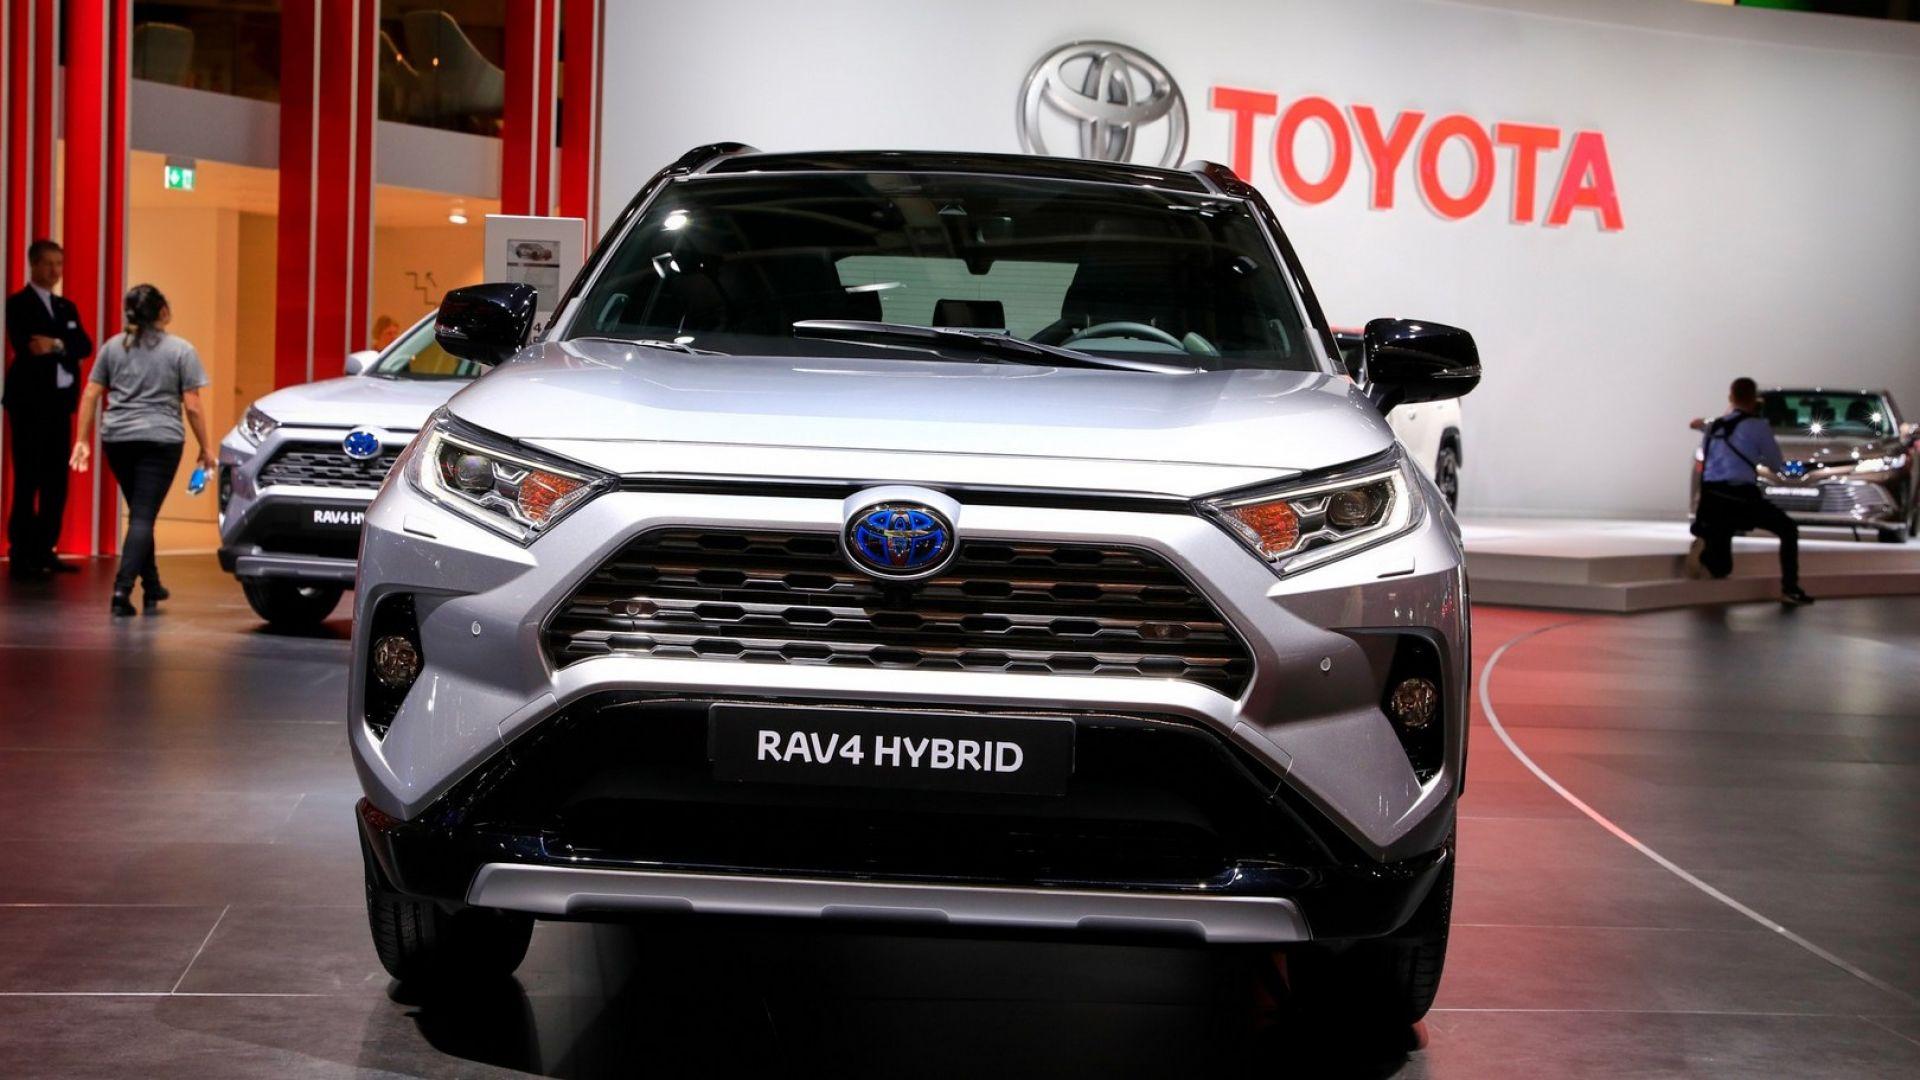 Toyota Rav4 Ibrida 2019 Dimensioni Scheda Tecnica